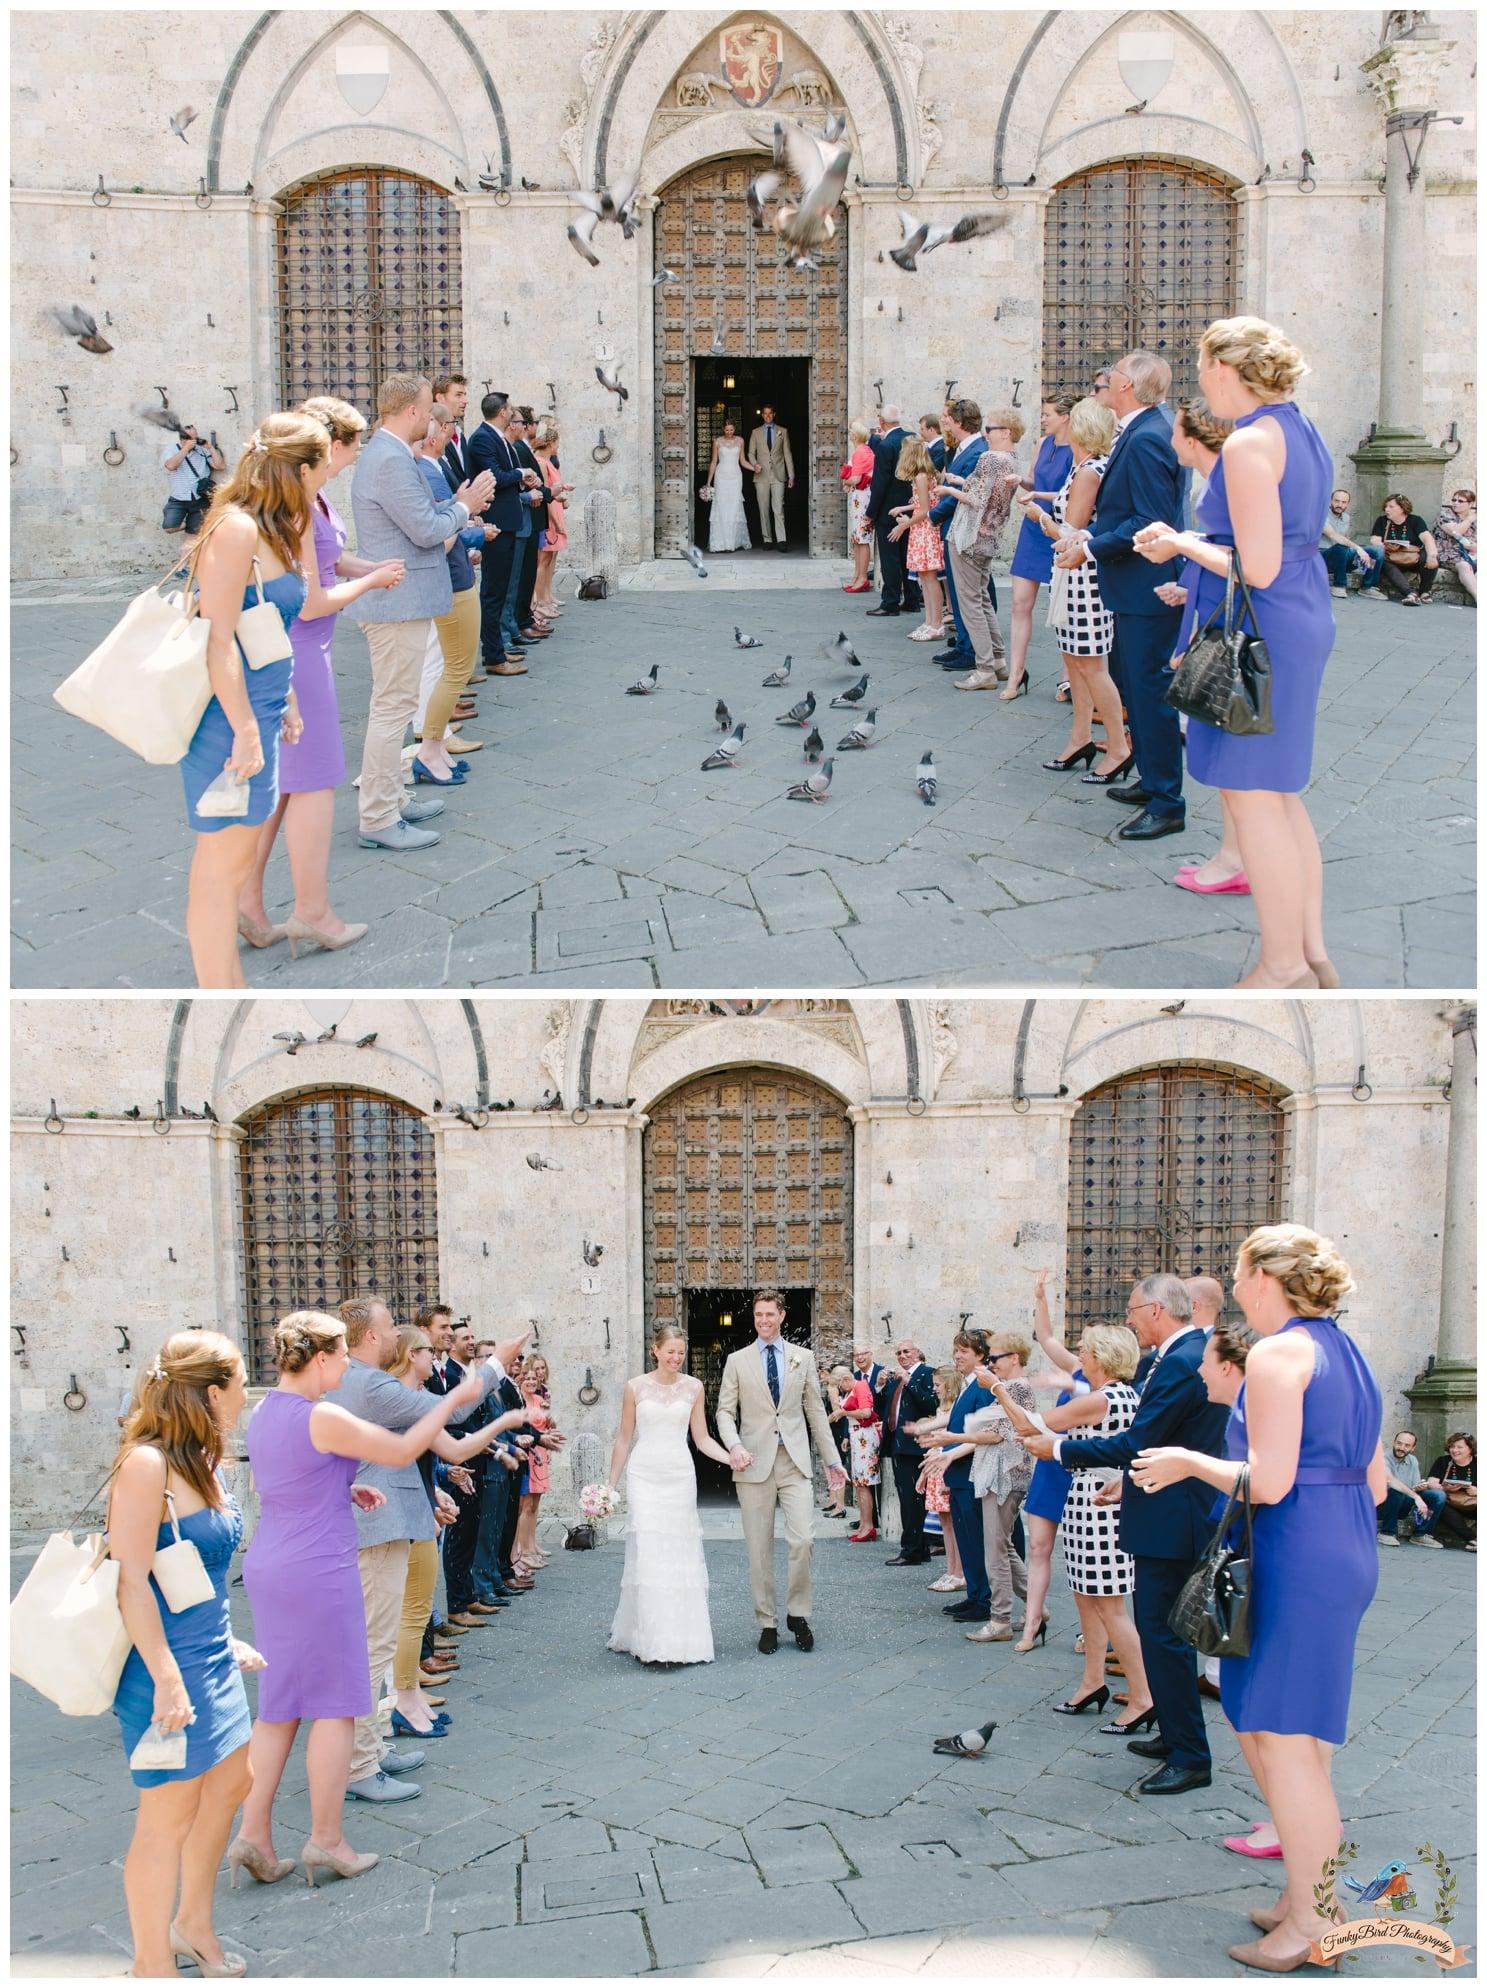 Wedding_Photographer_in_Tuscany_Italy_0017.jpg